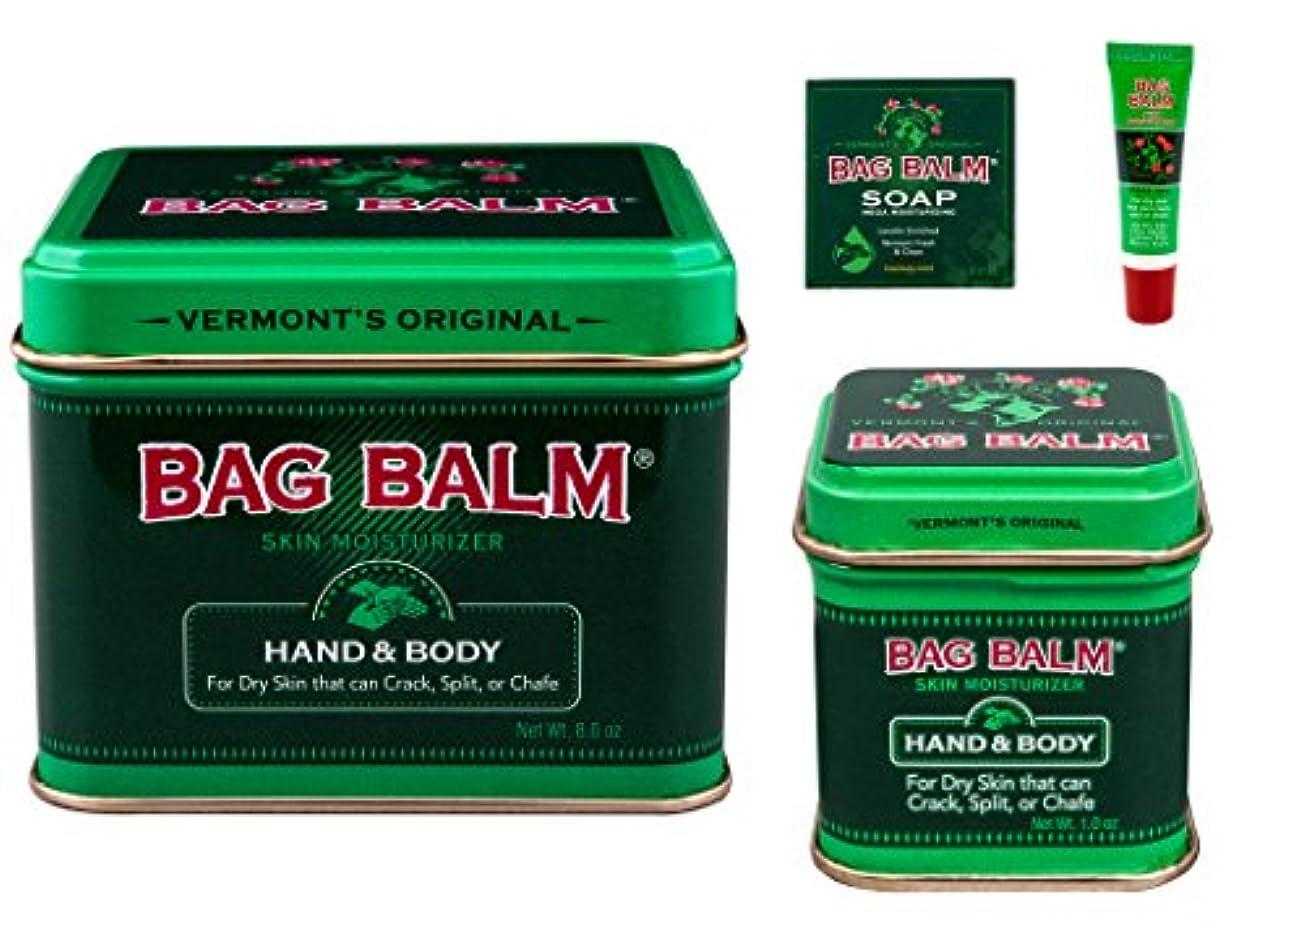 Bag Balm バリューバンドル(8オンス、1オンス缶は、チューブをオン-行くとメガモイスチャーソープ)